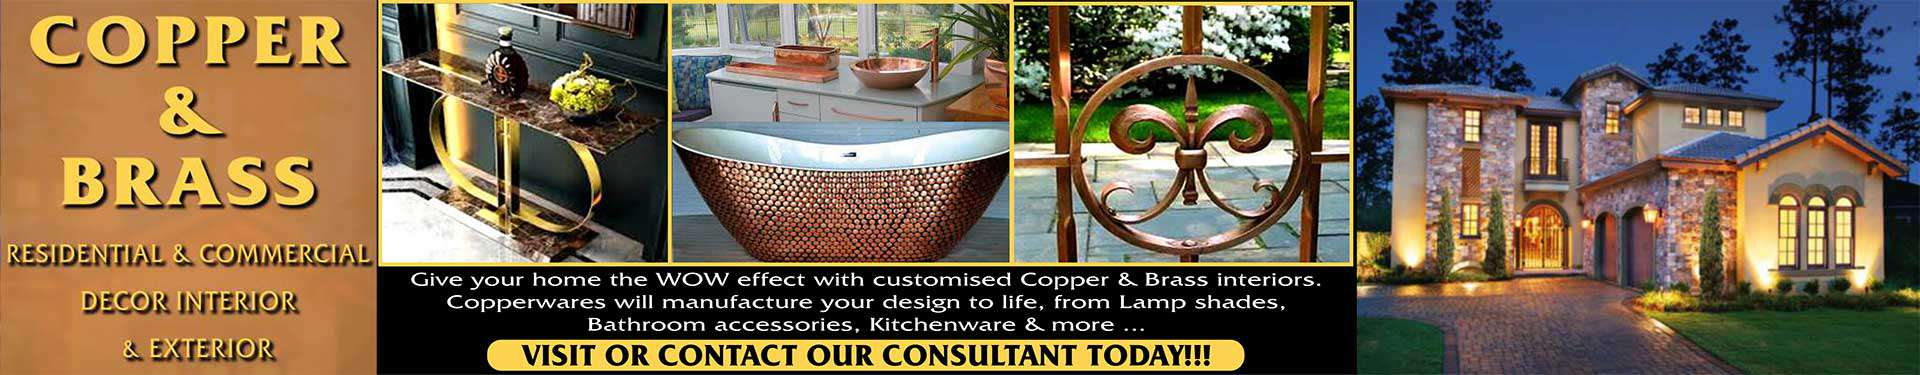 Copper_Brass_Banner